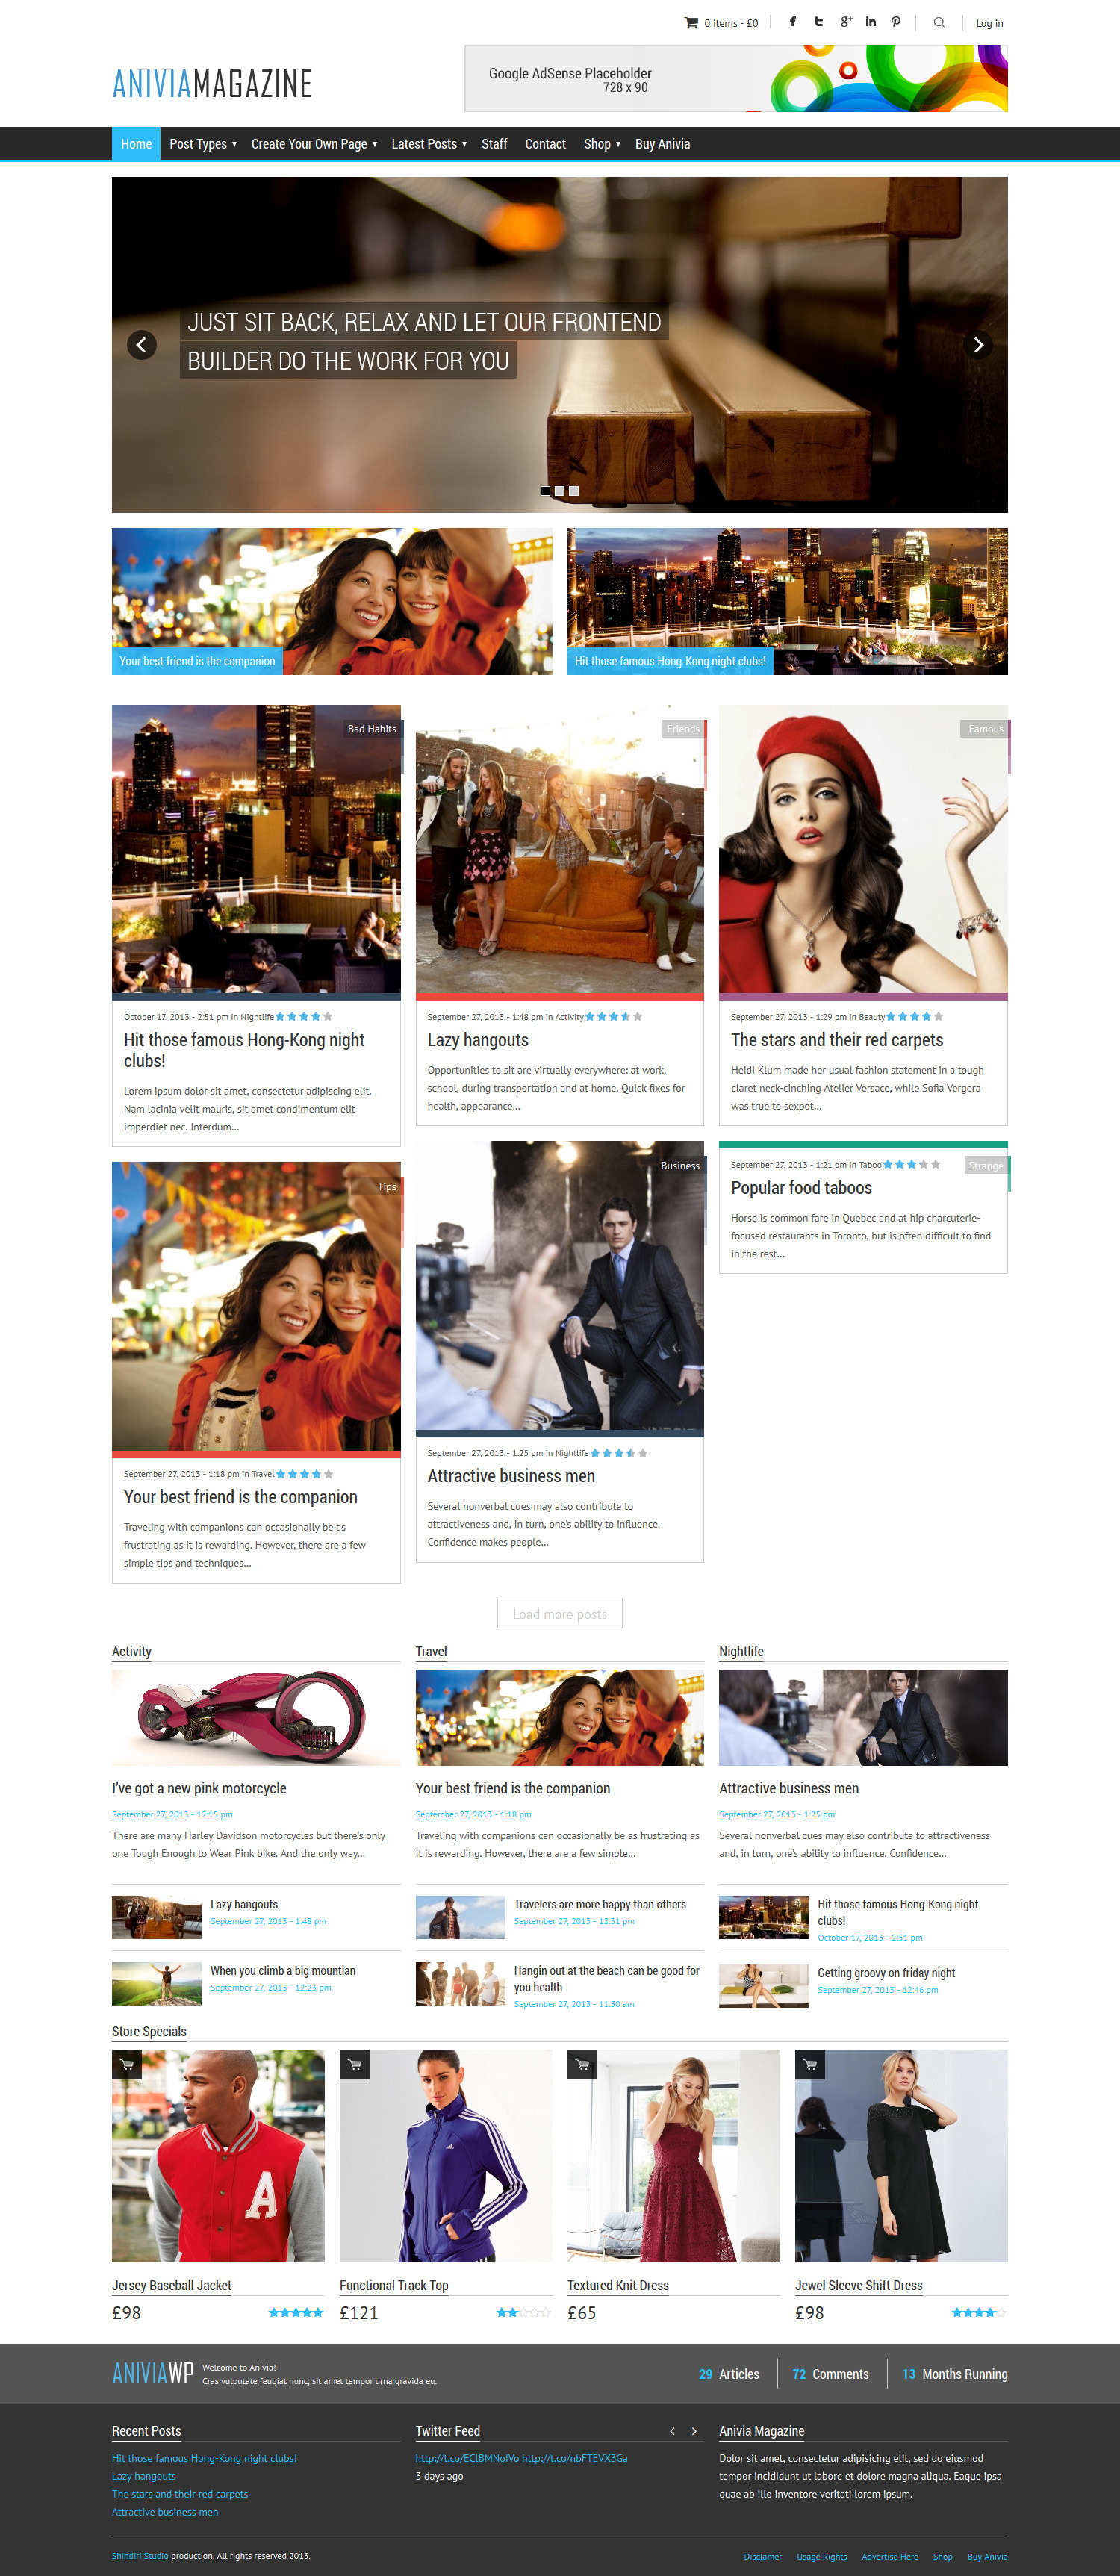 Anivia - News, Magazine, Blog WordPress Template